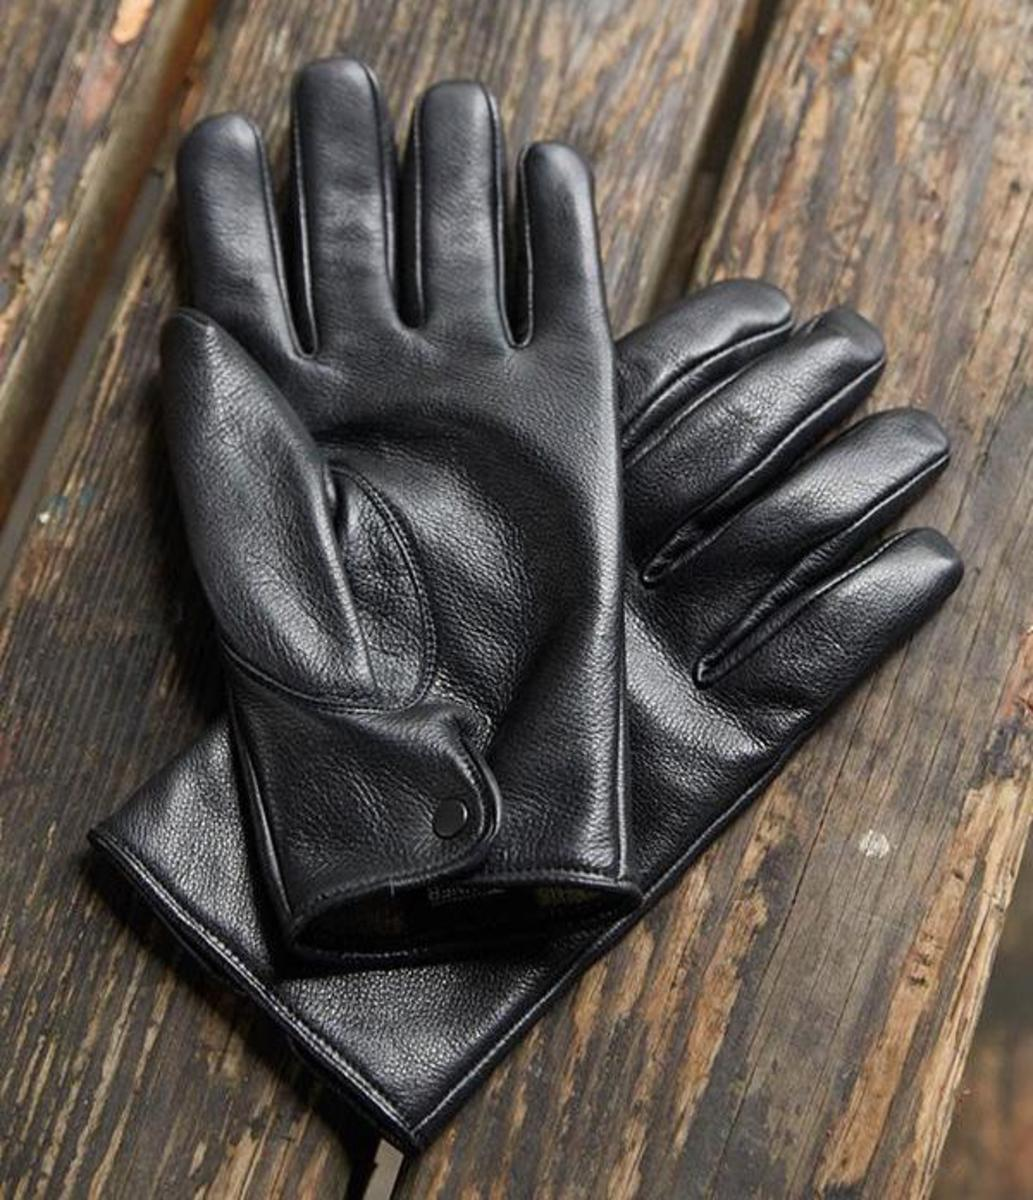 Tanner Goods Utility Glove